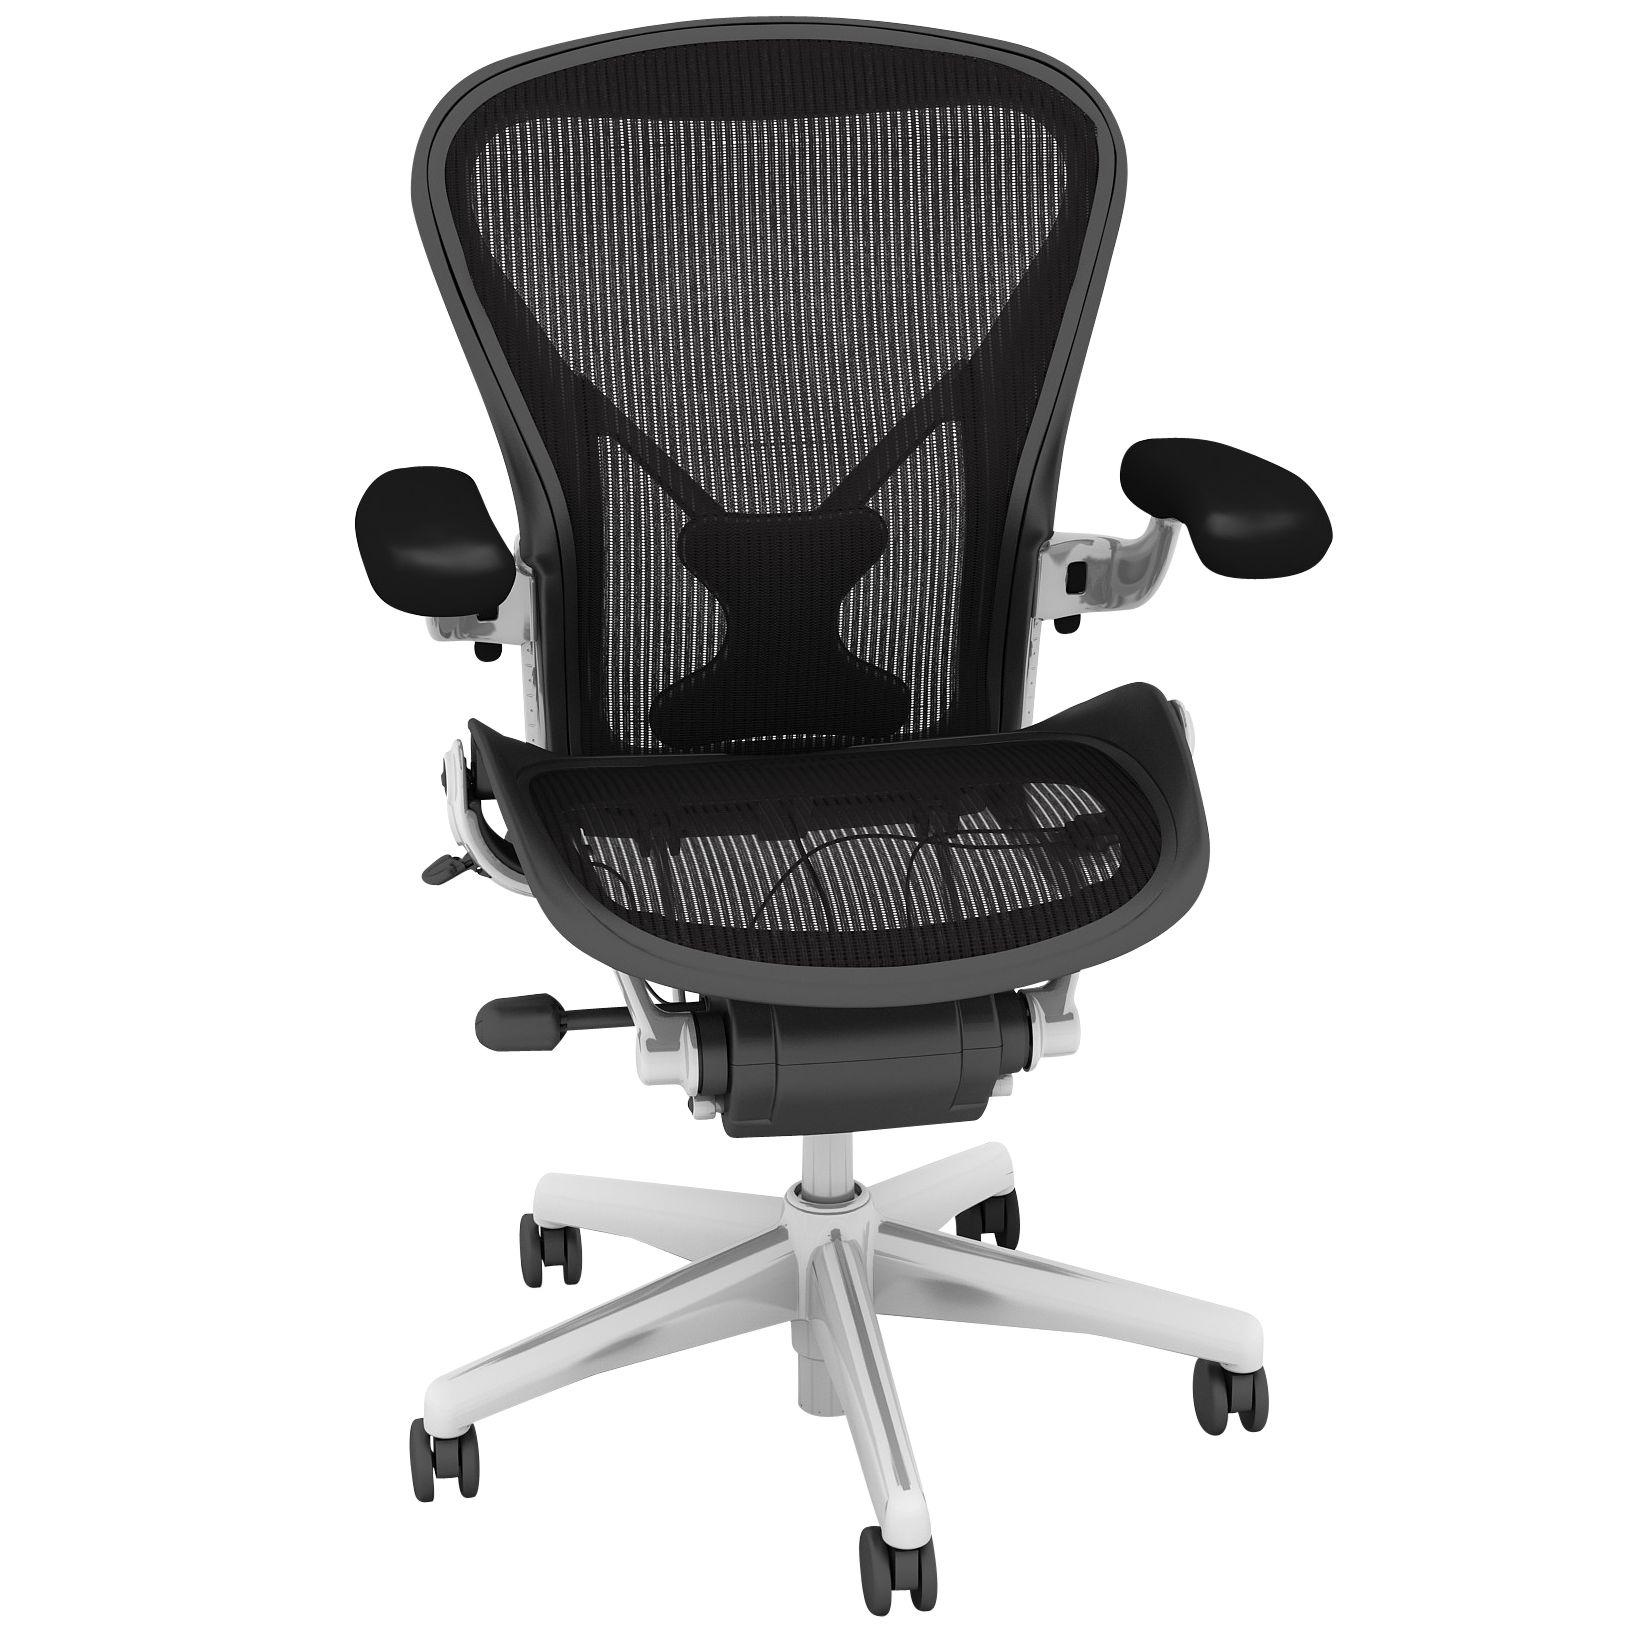 Herman Miller Herman Miller Aeron Office Chair, Polished Aluminium